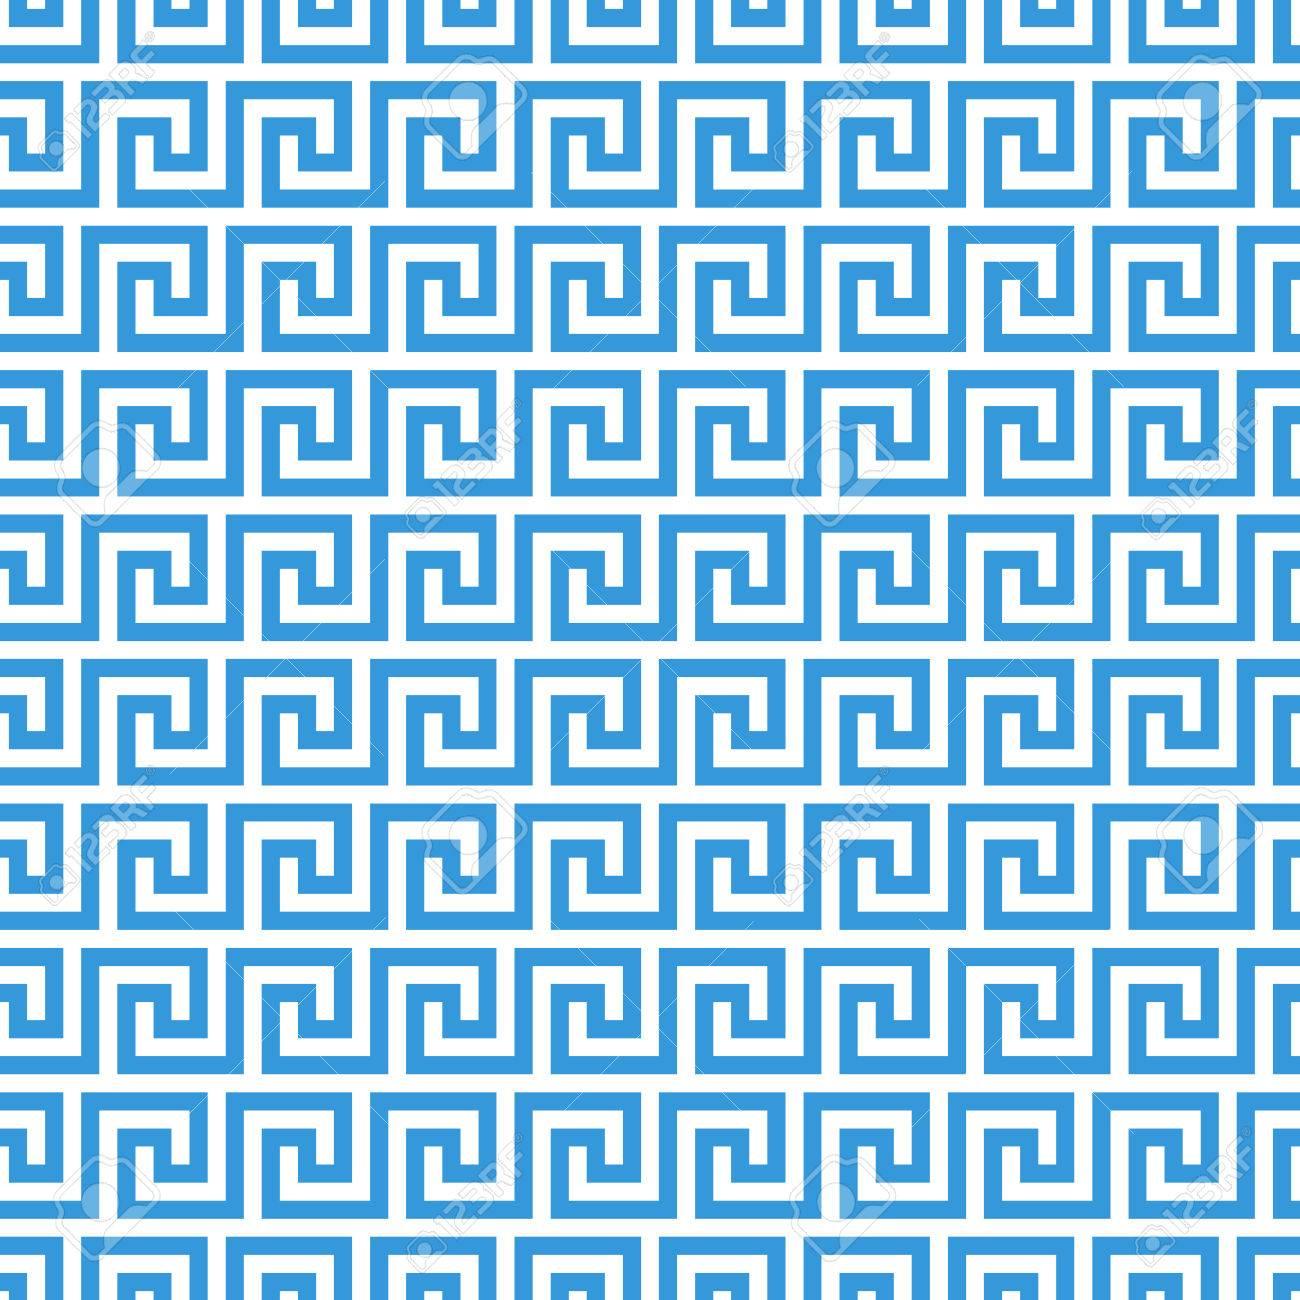 Griechische Welle Ornament Muster Kostenlose Vektor